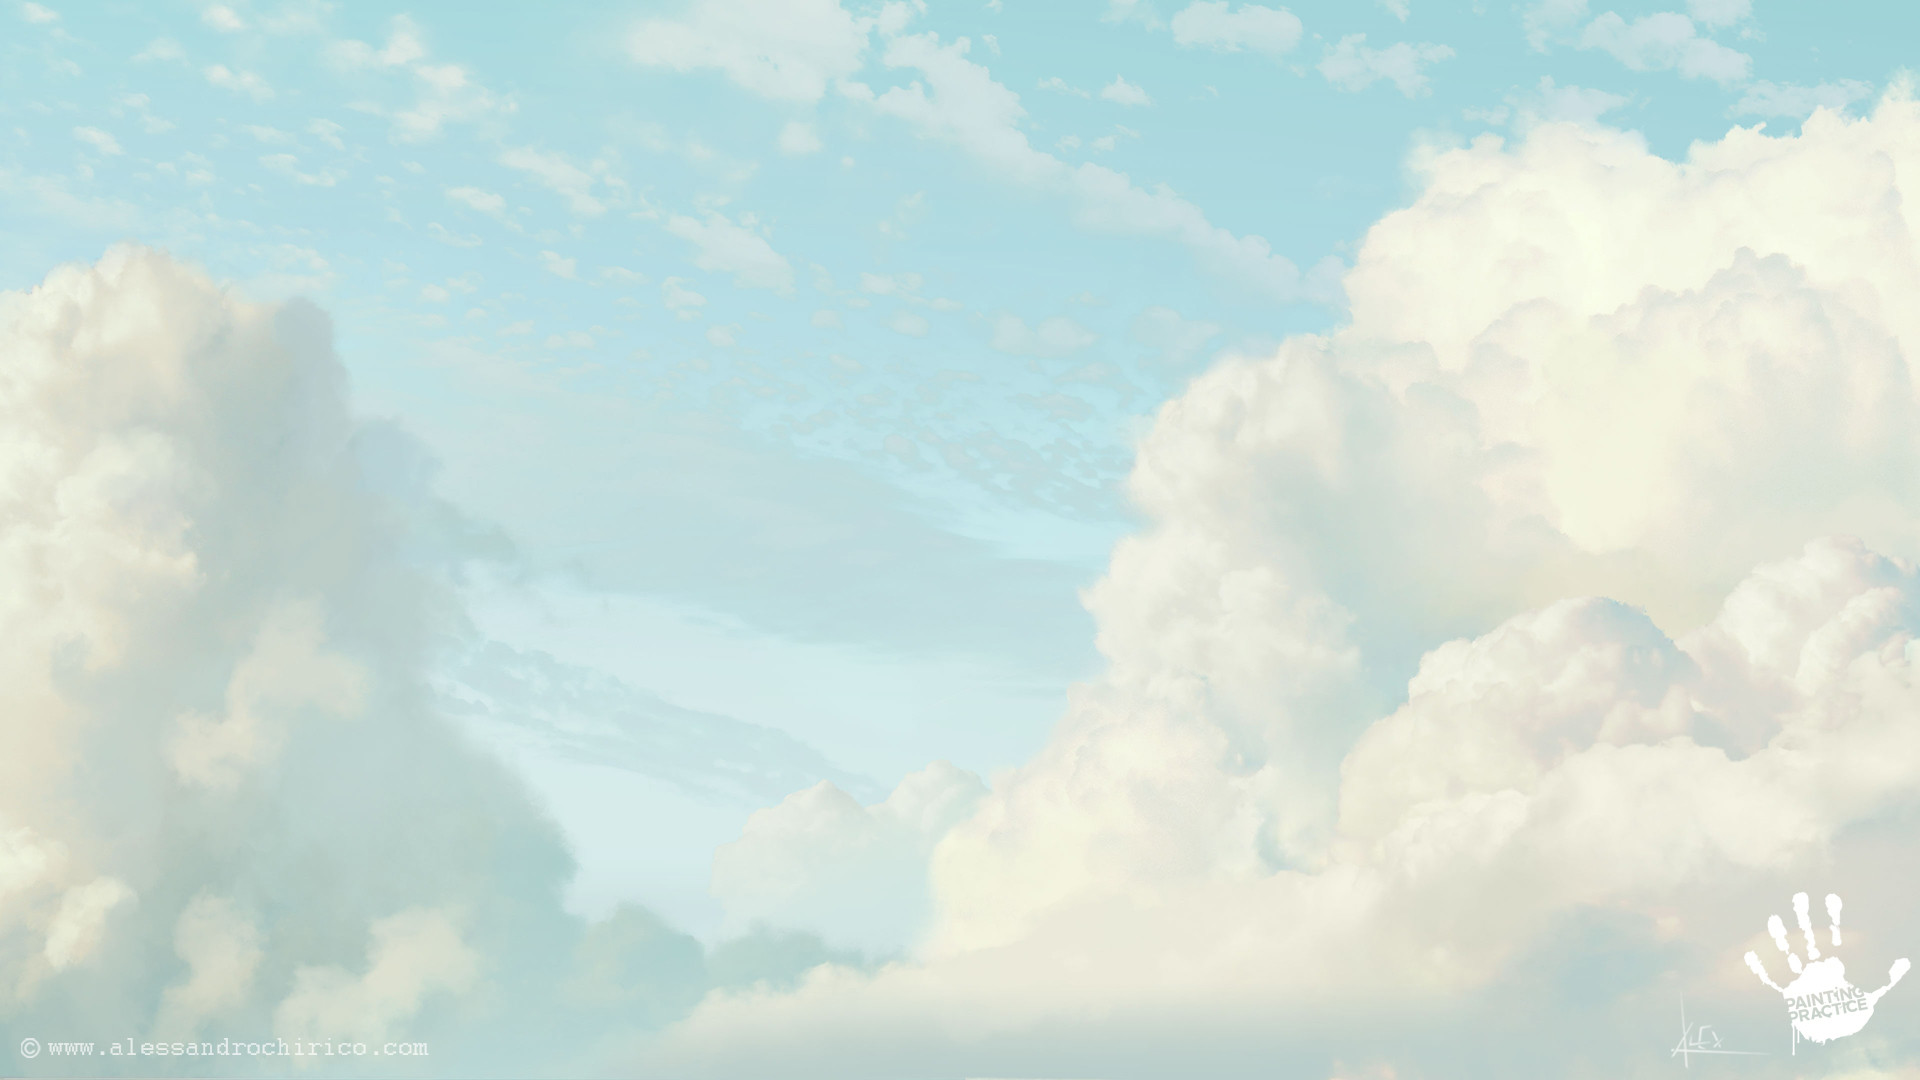 Alessandro chirico 24 sky matte alessandro chirico